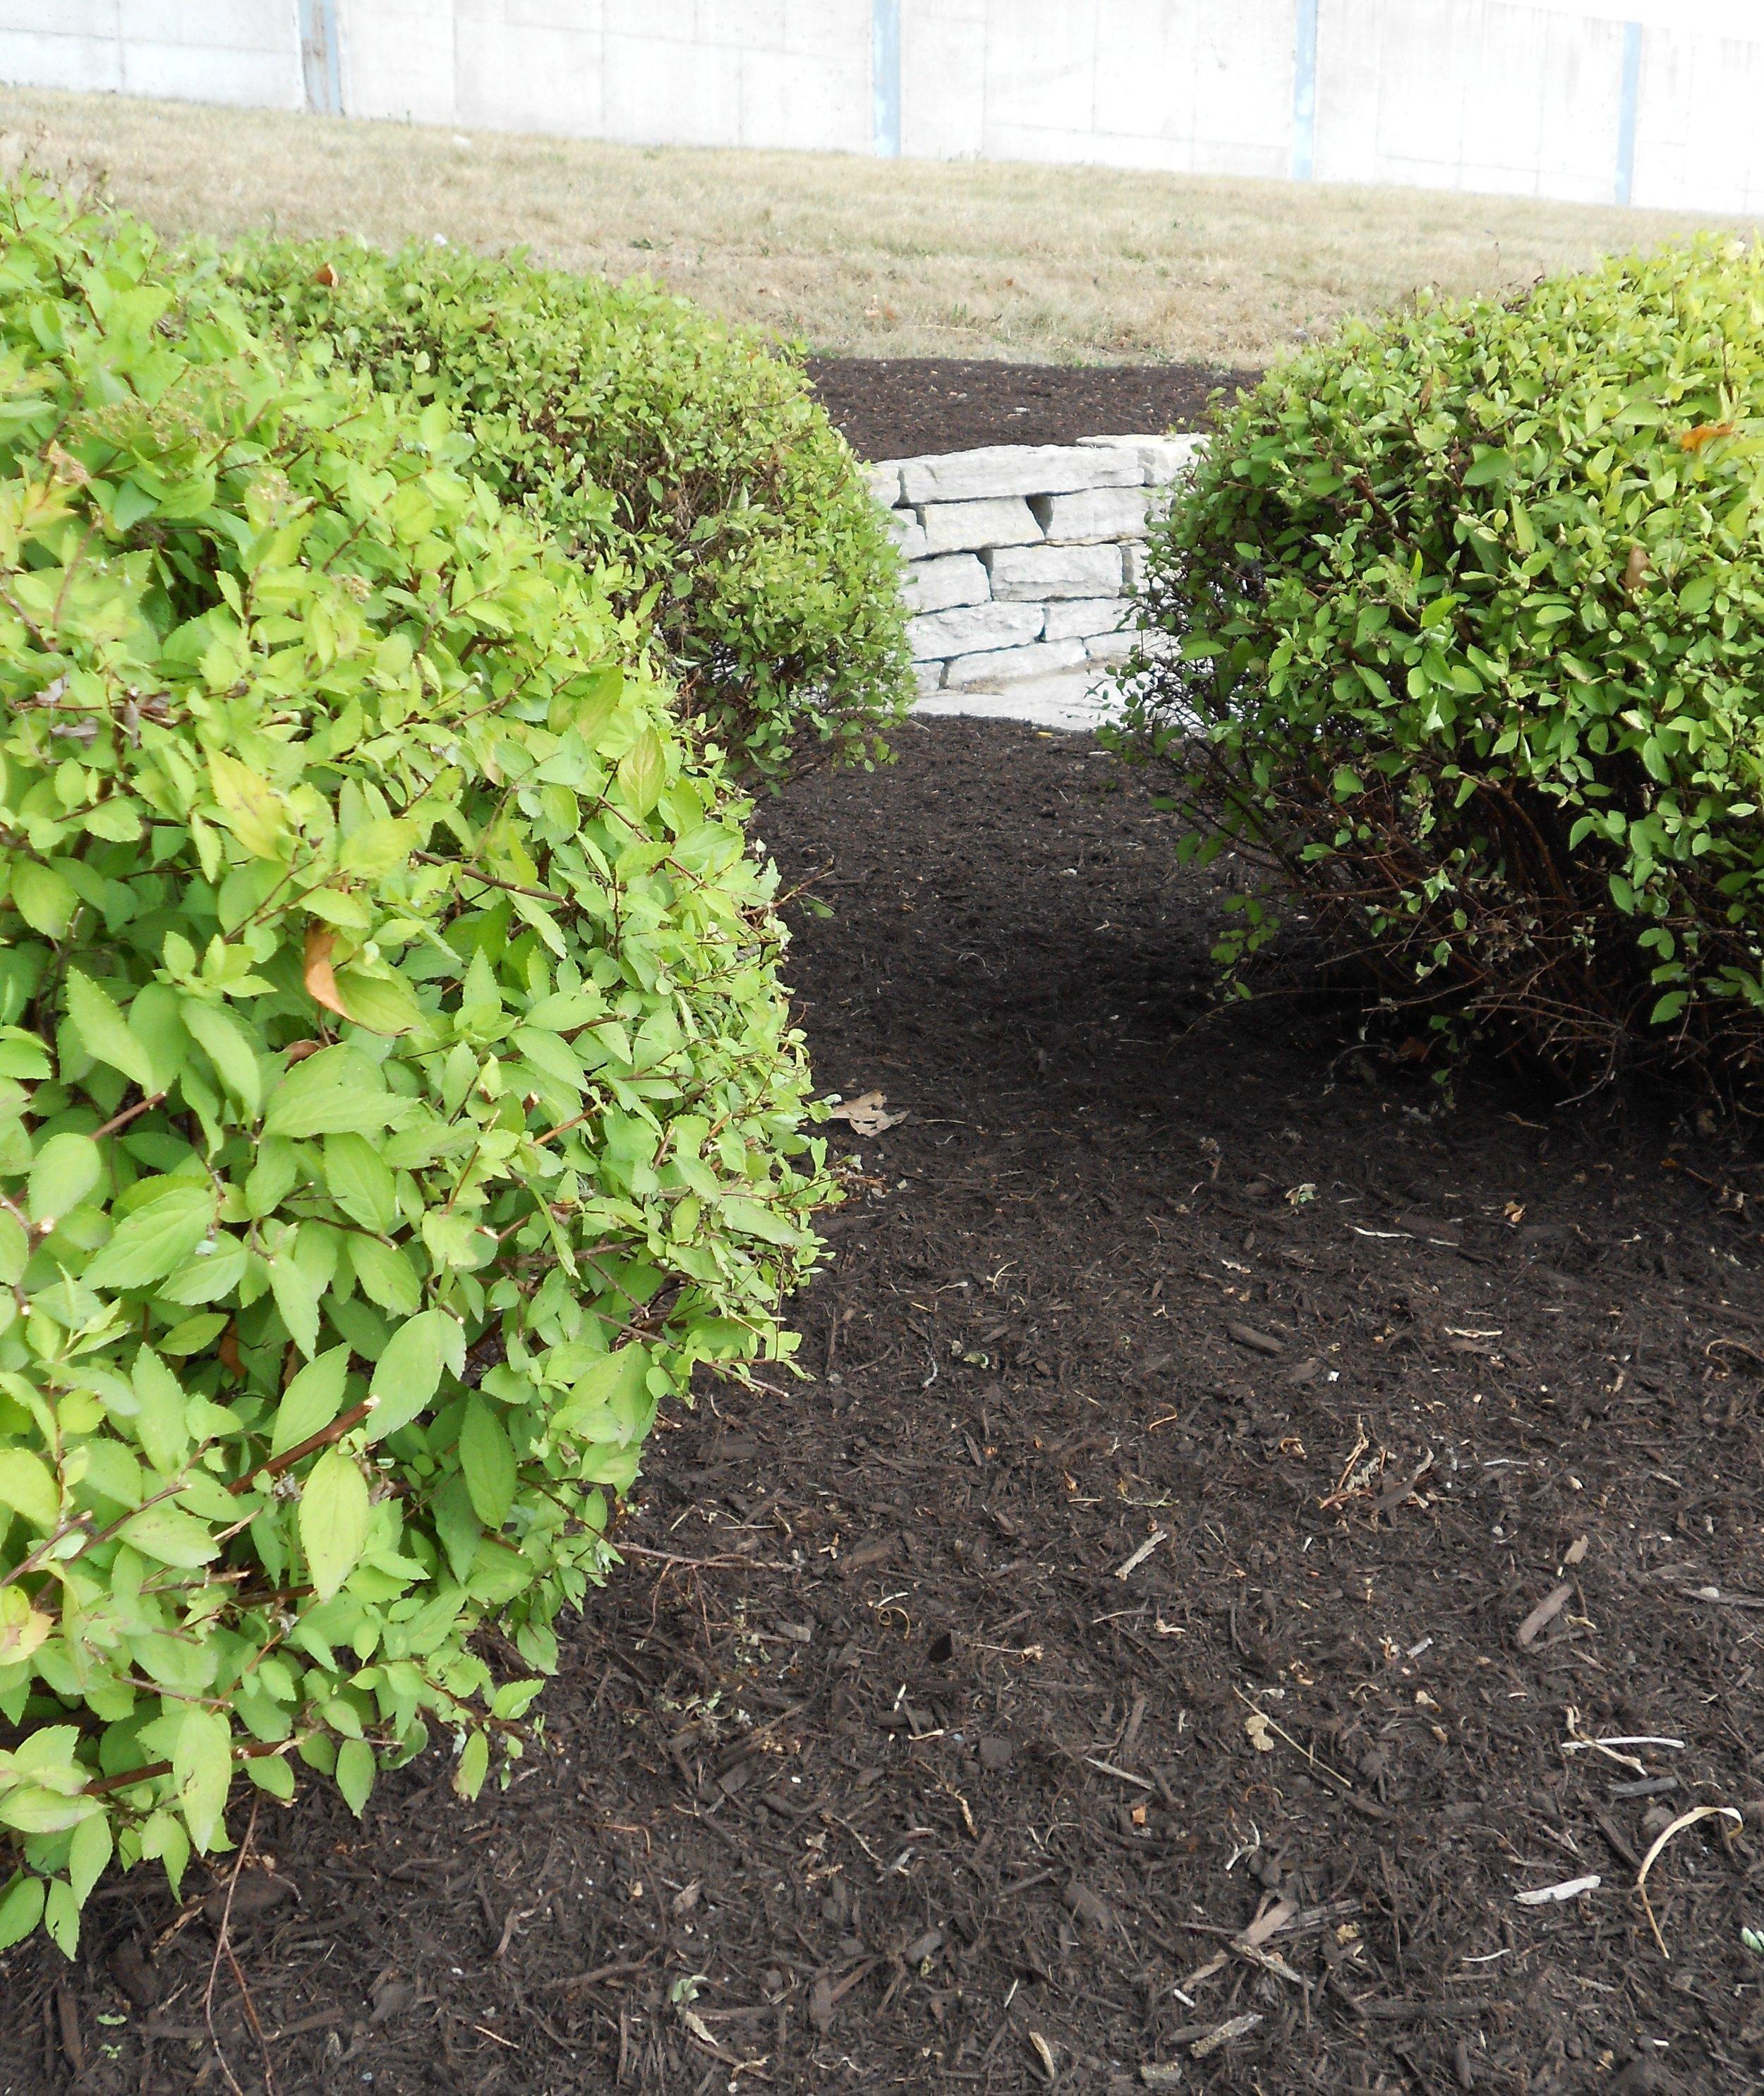 Mulchshrubberpic.JPG